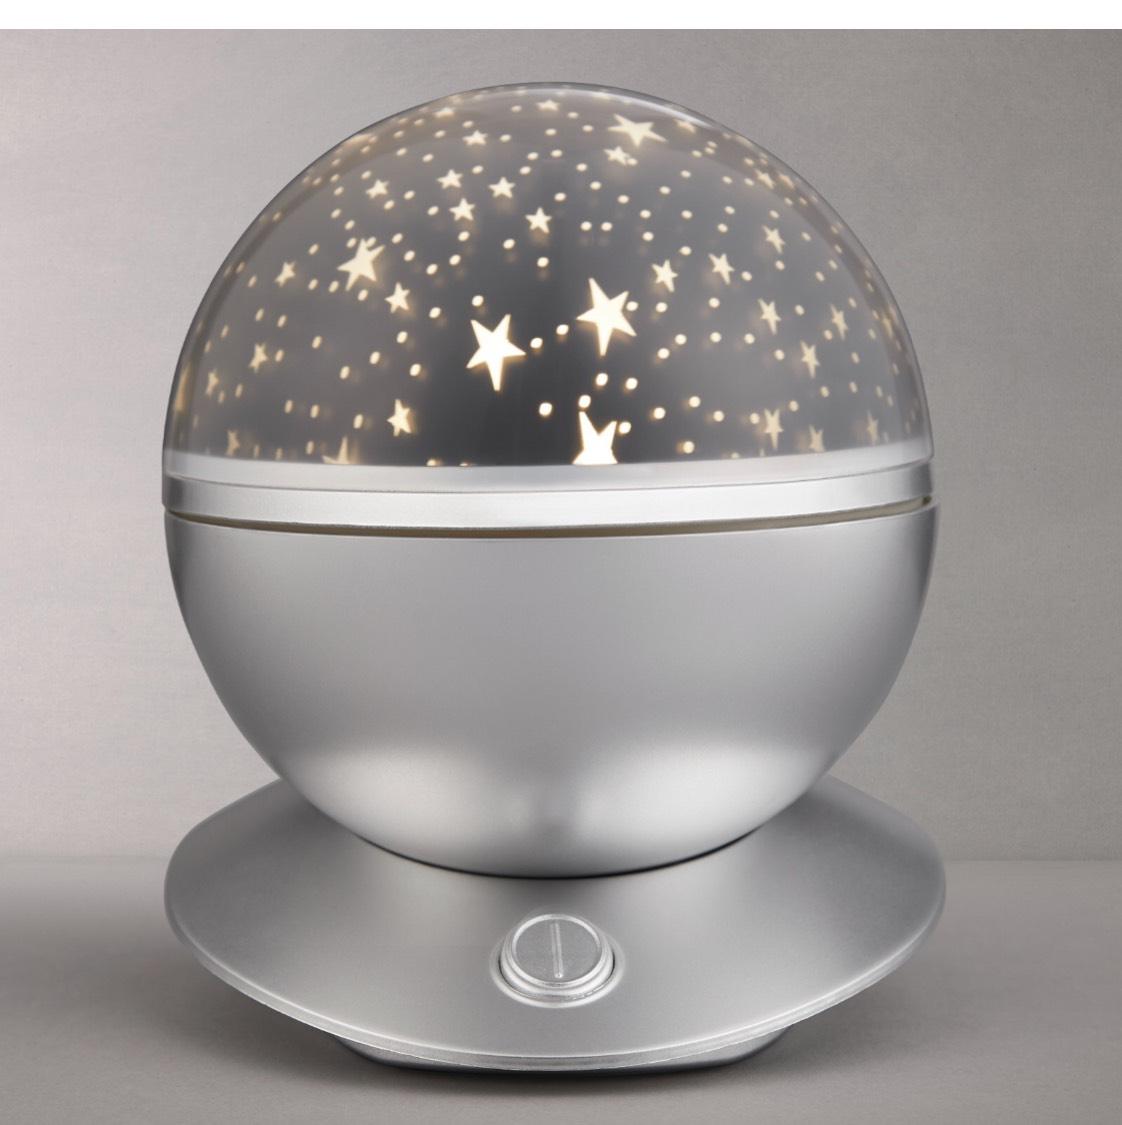 Back in stock - Starry Sky LED Night Light - £15 (Plus £2 P&P) @ John Lewis